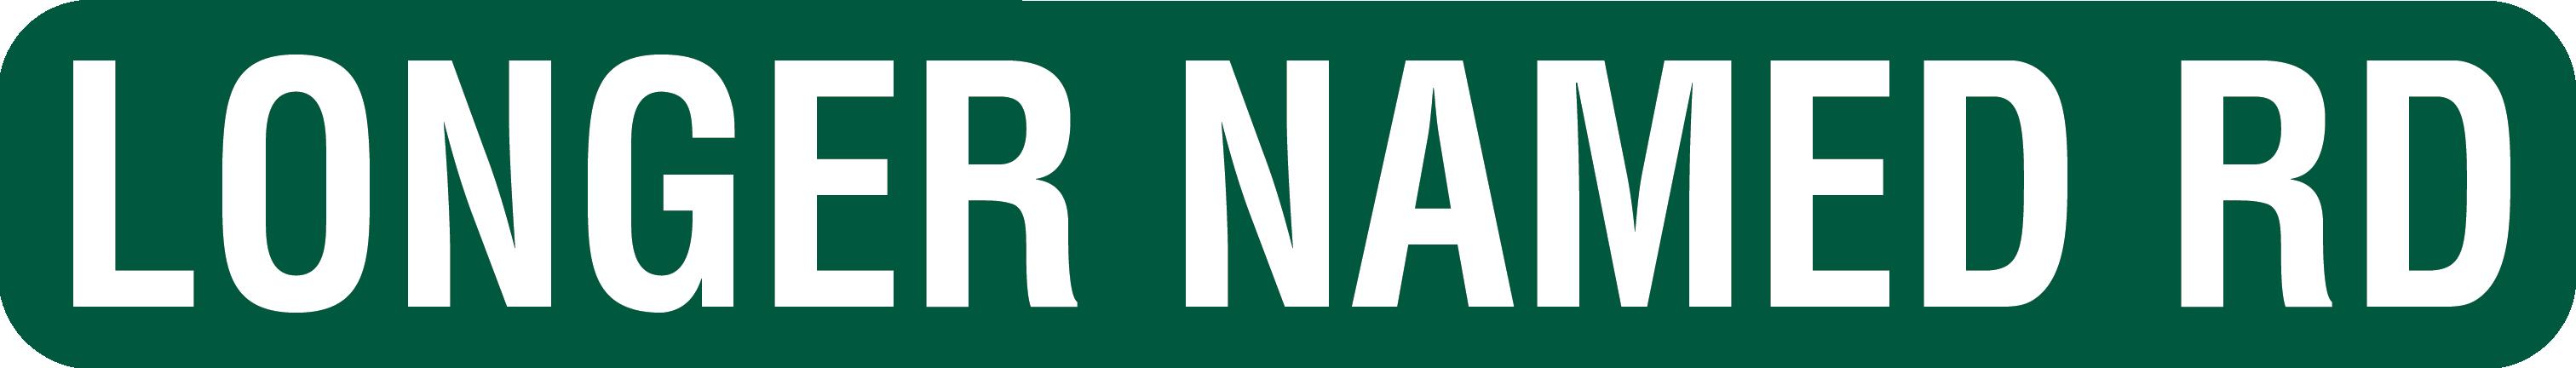 6x42 Street Sign